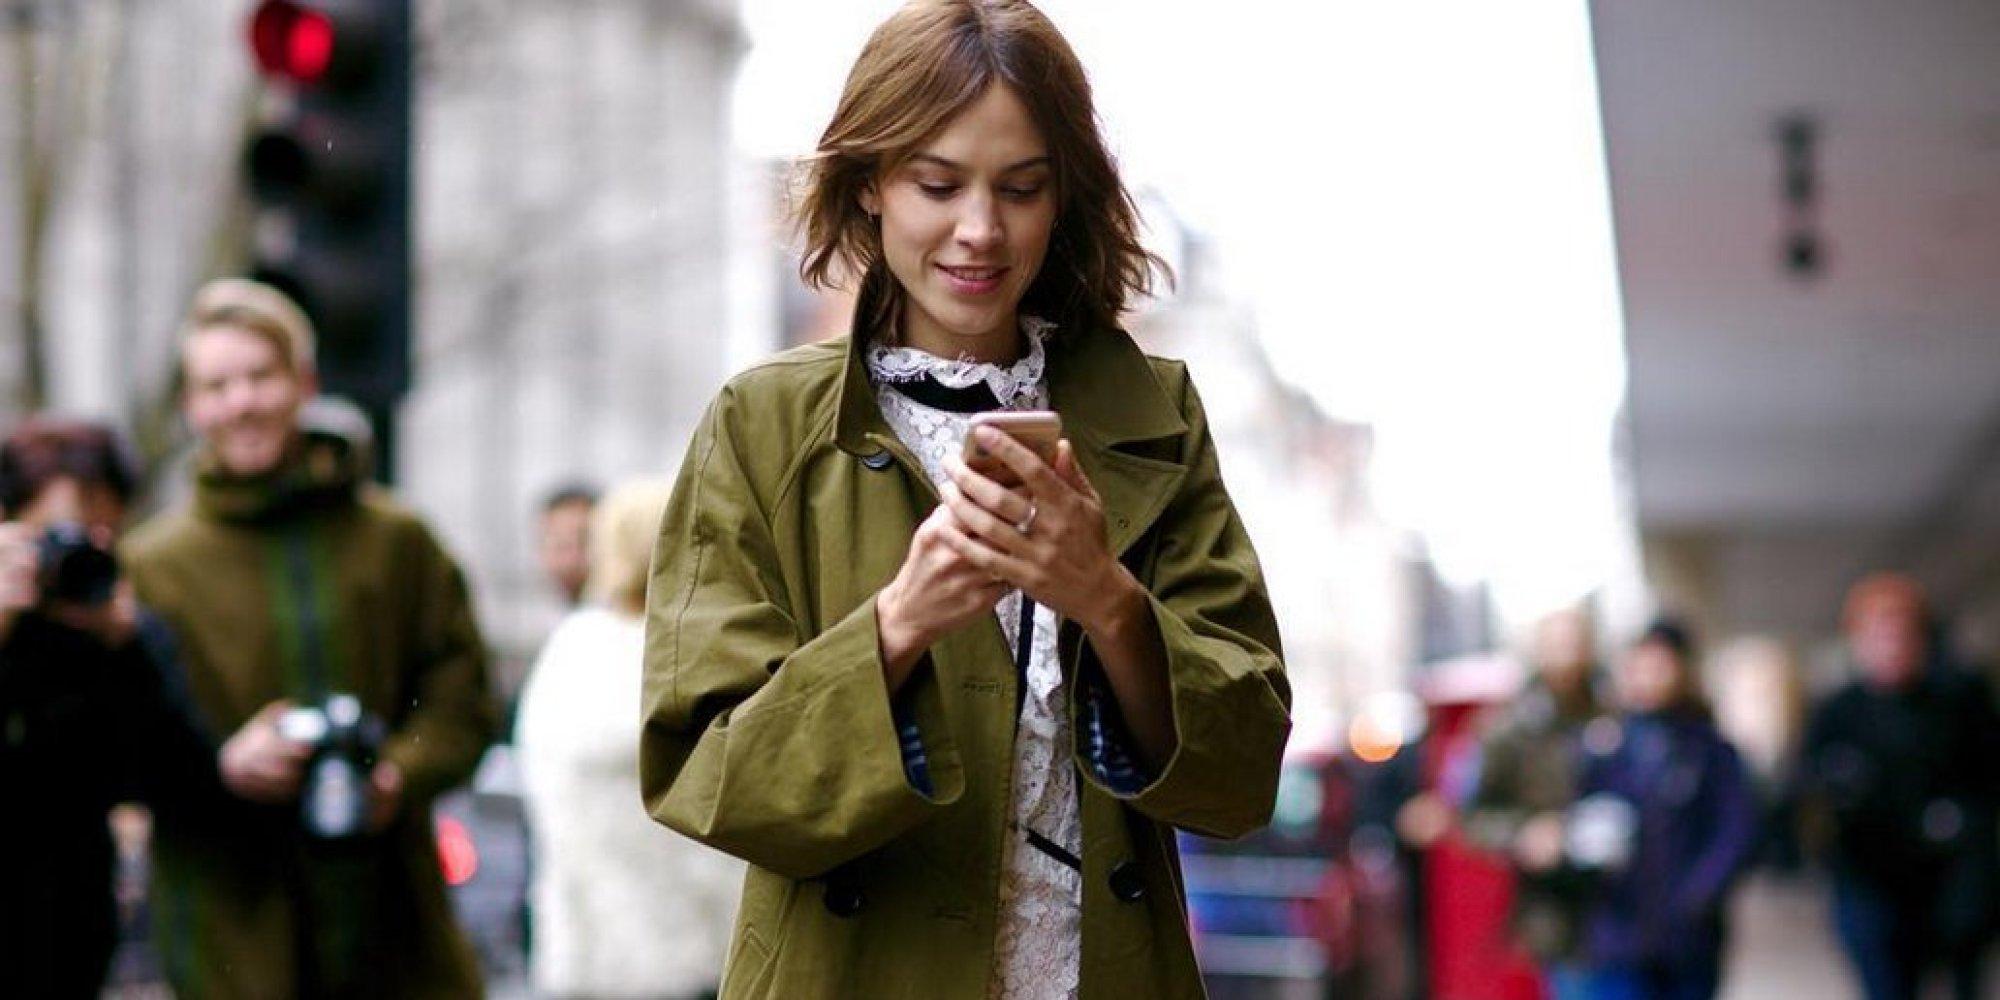 London Fashion Week 2016 Alexa Chung 39 S Outfits A Definitive Guide Huffpost Uk